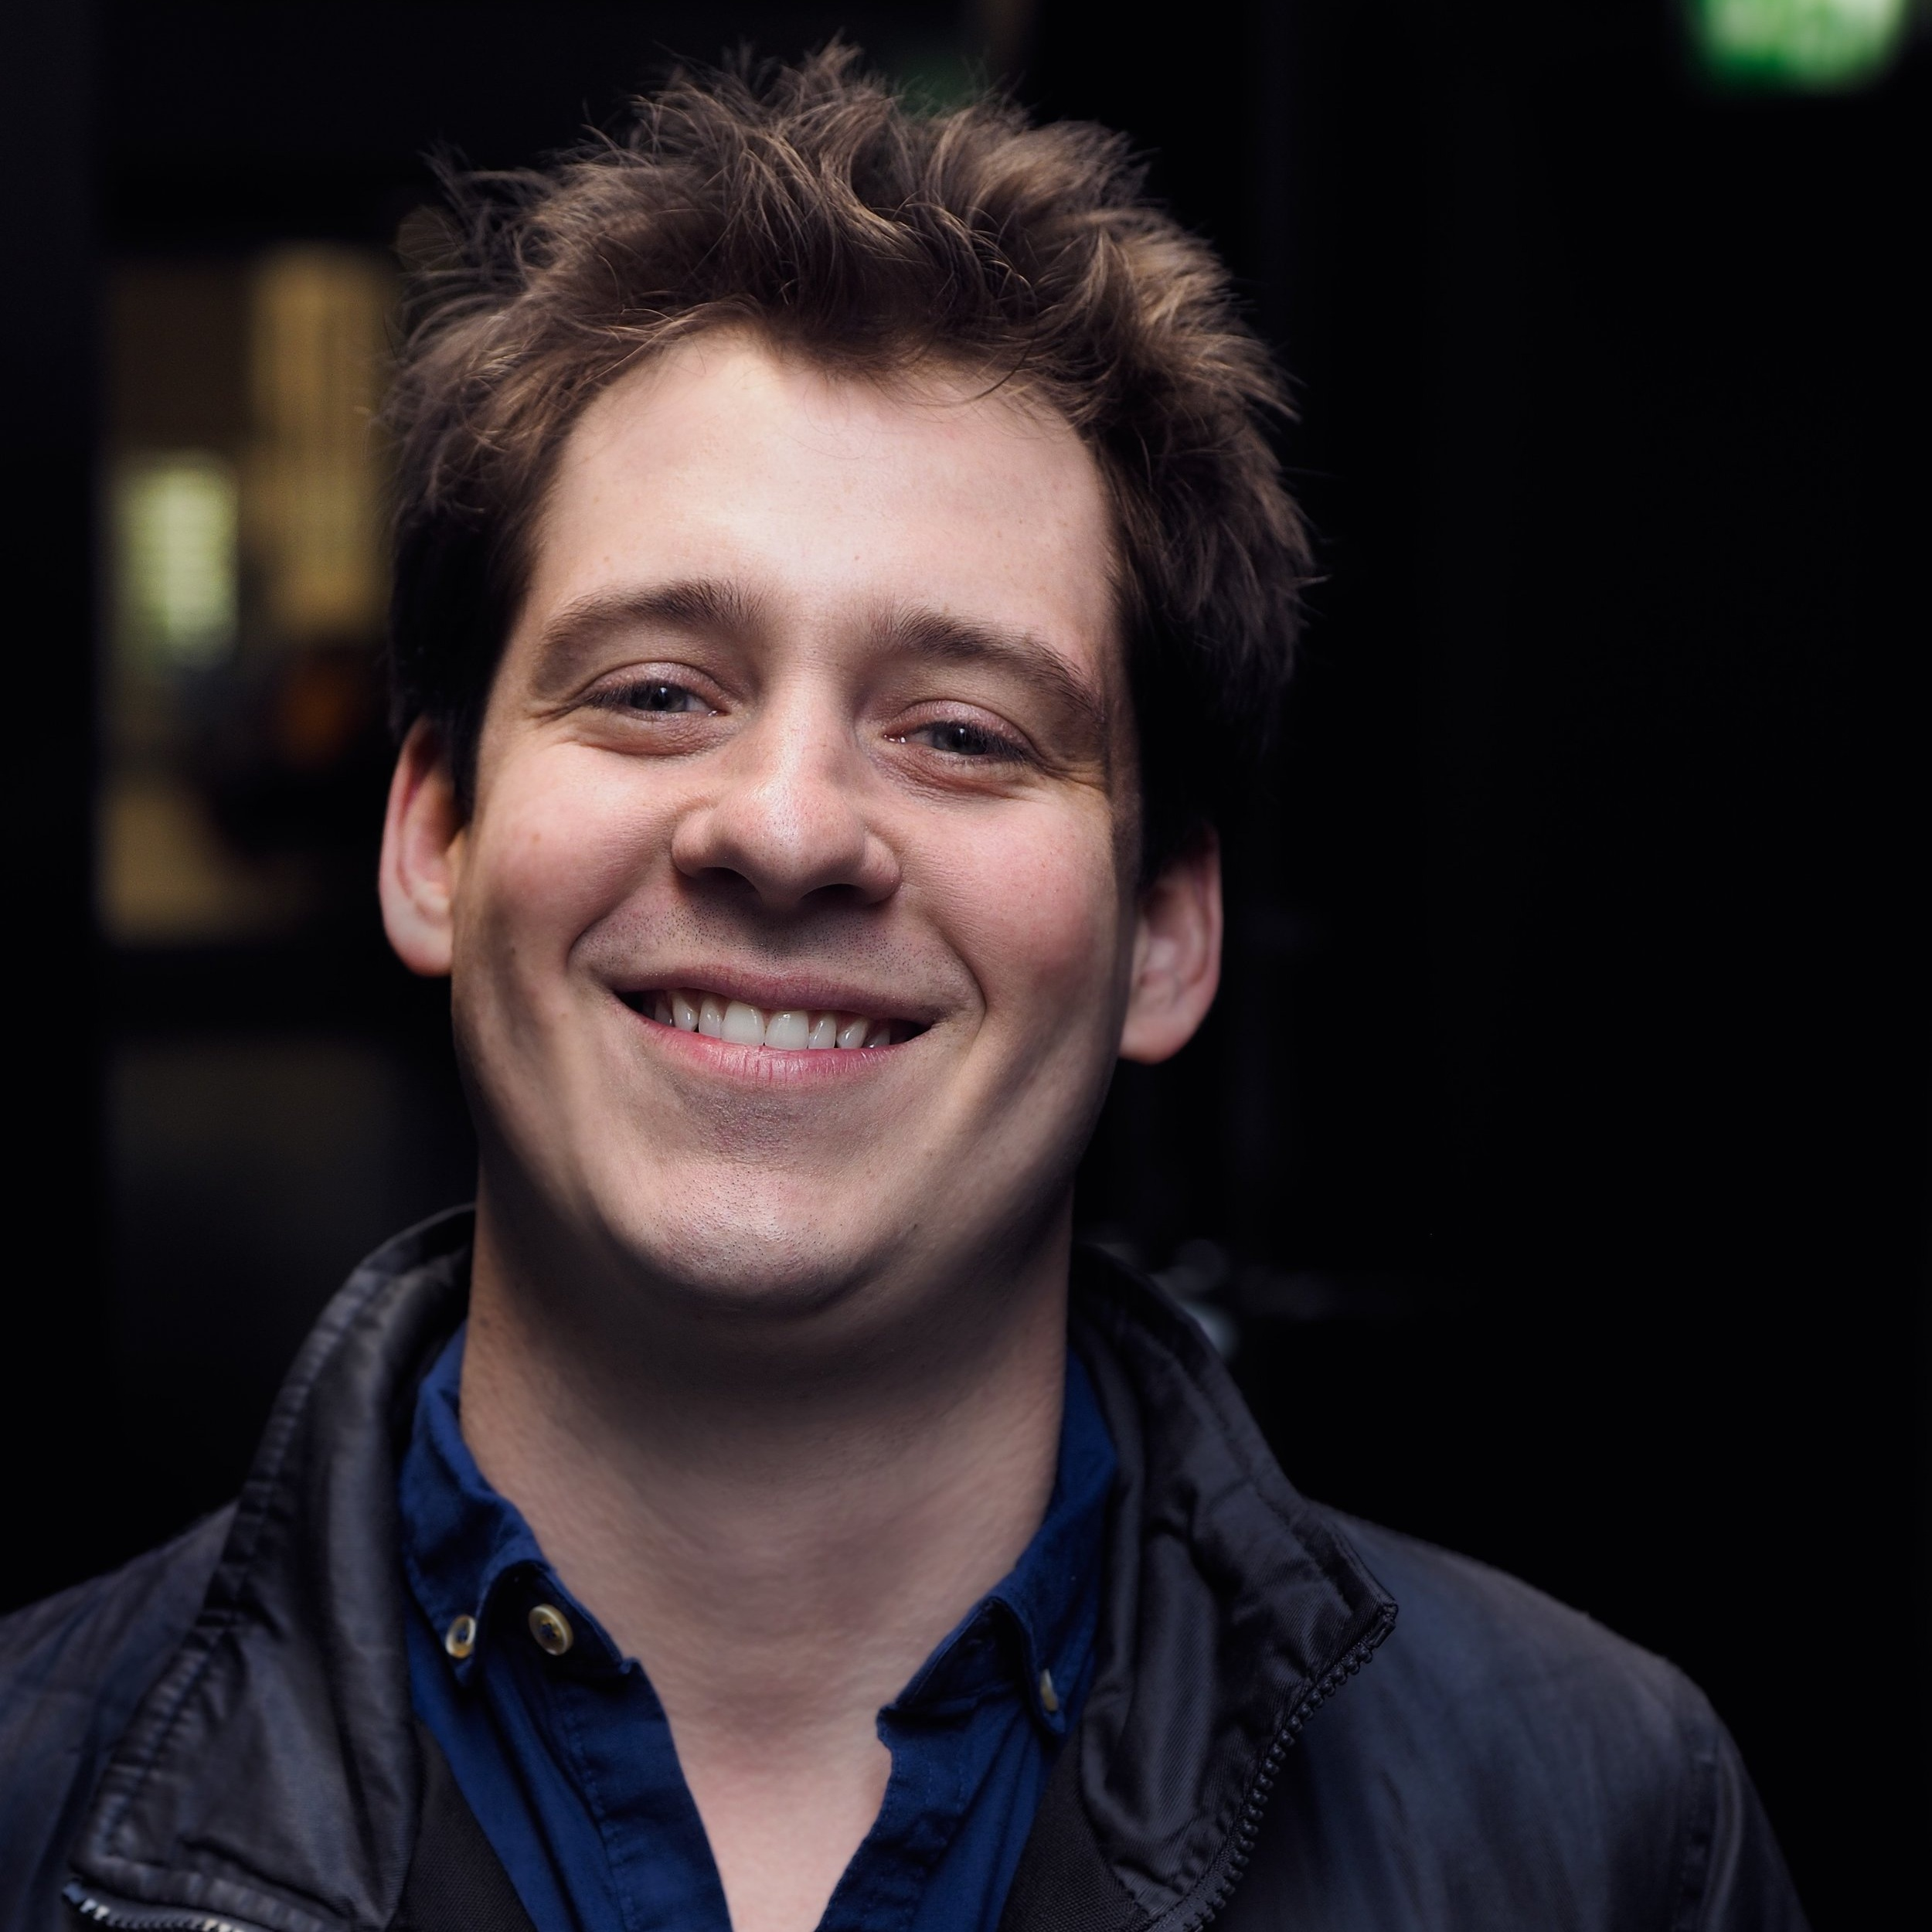 PAUL MOODY - MUSIC DIRECTOR